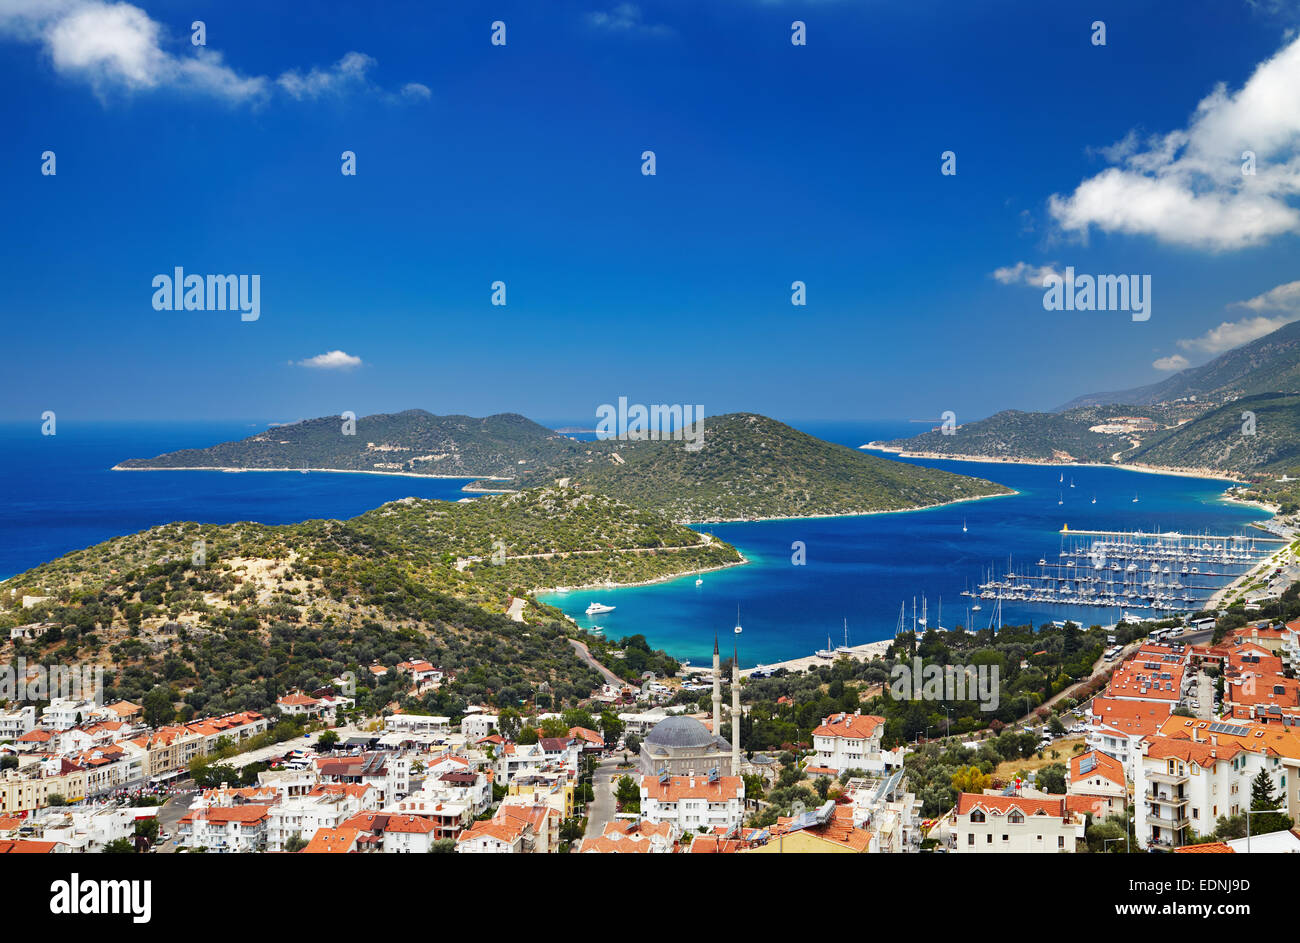 Città Kas, costa mediterranea, Turchia Immagini Stock